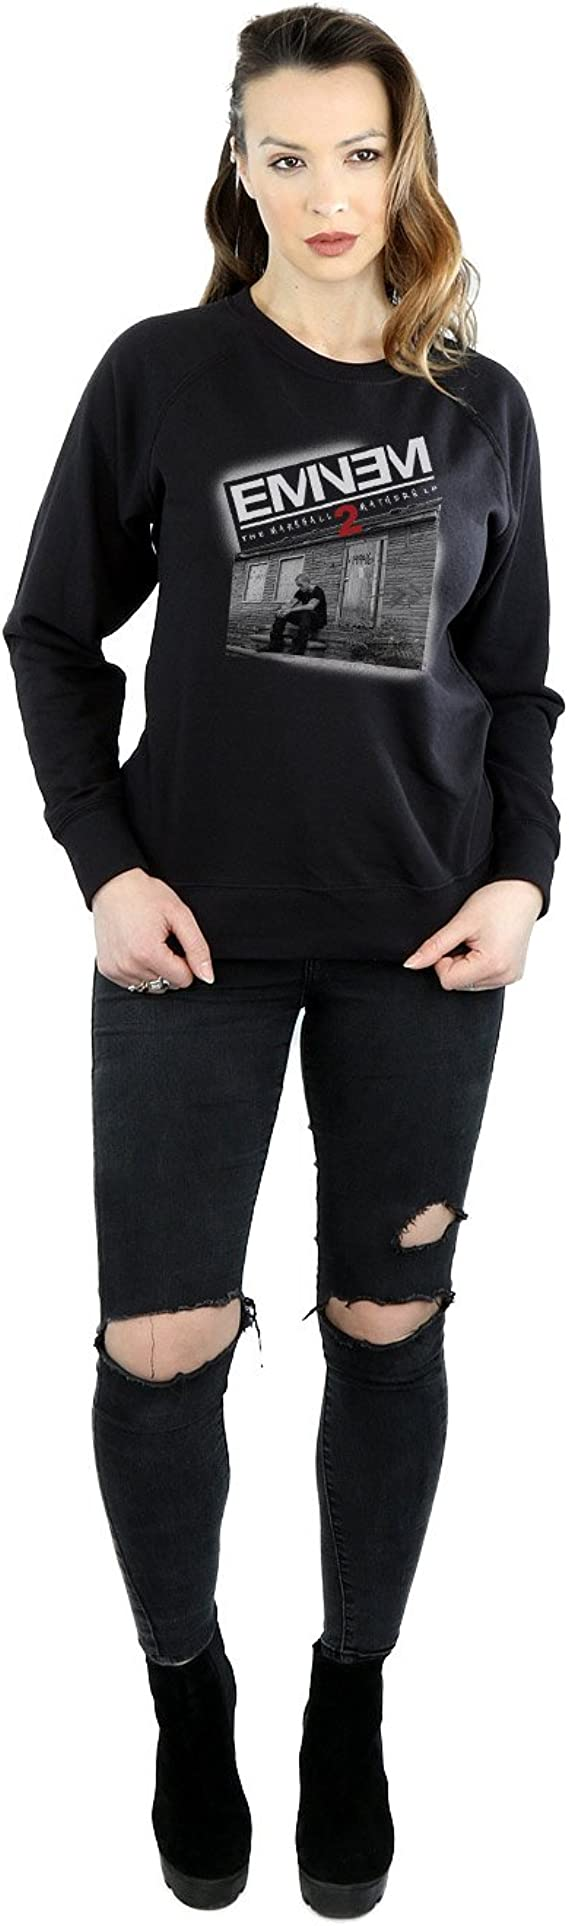 Eminem Mujer Marshall Mathers 2 Camisa De Entrenamiento ...